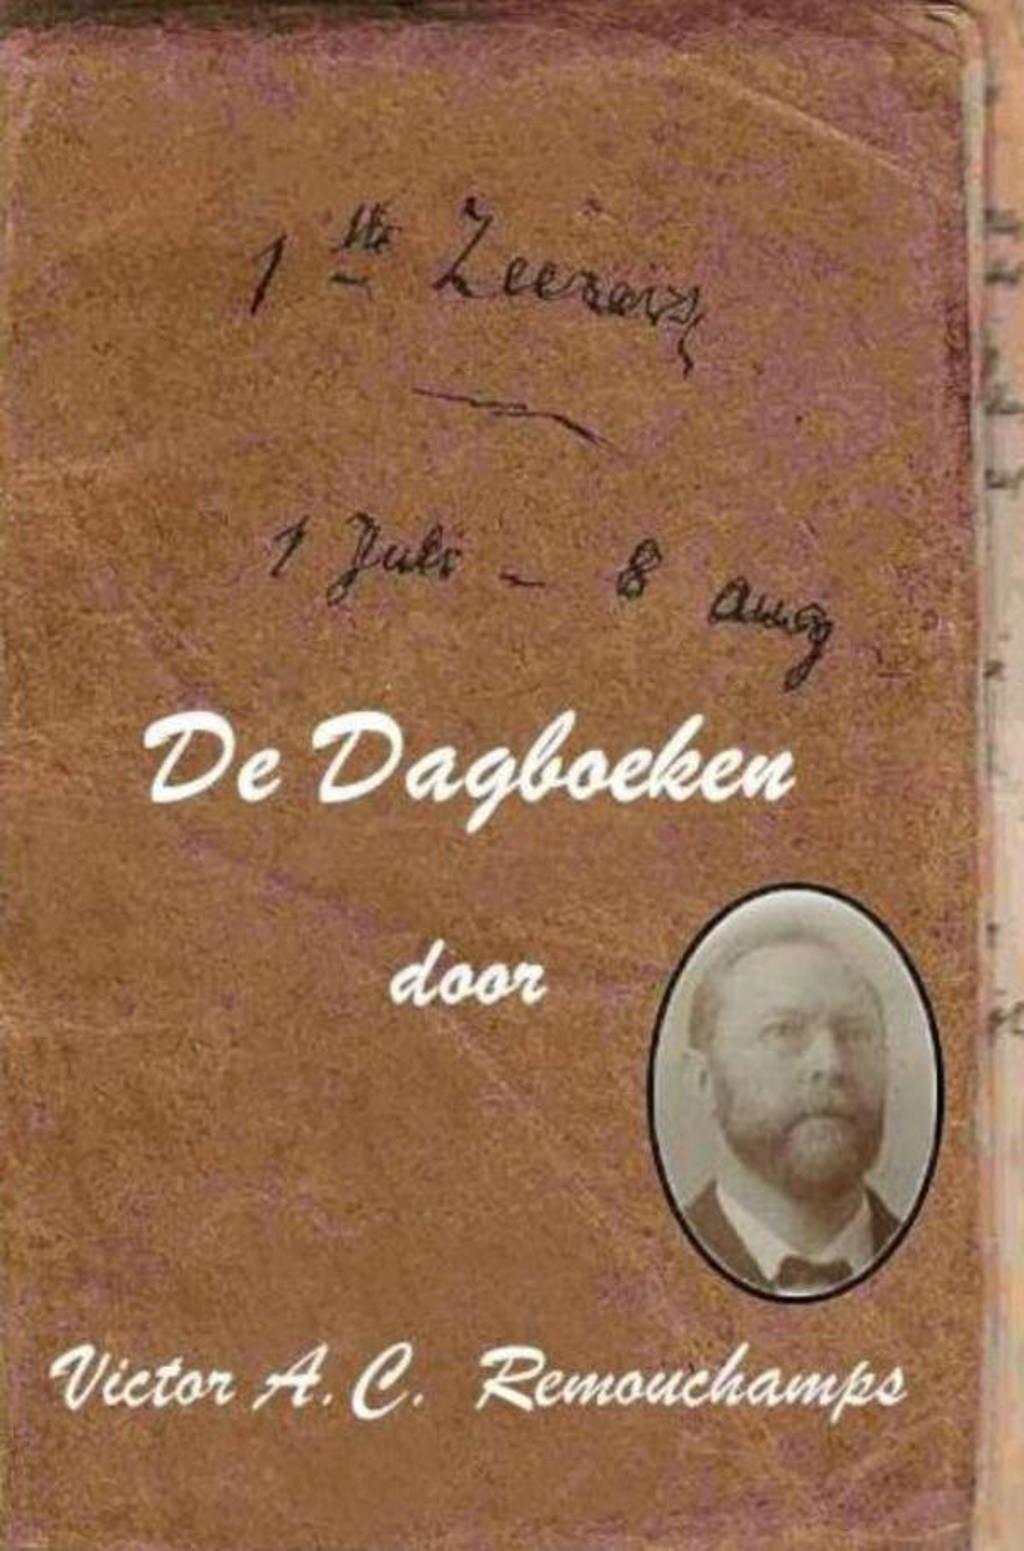 De dagboeken - Edouard Remouchamps en Victor A.C. Remouchamps